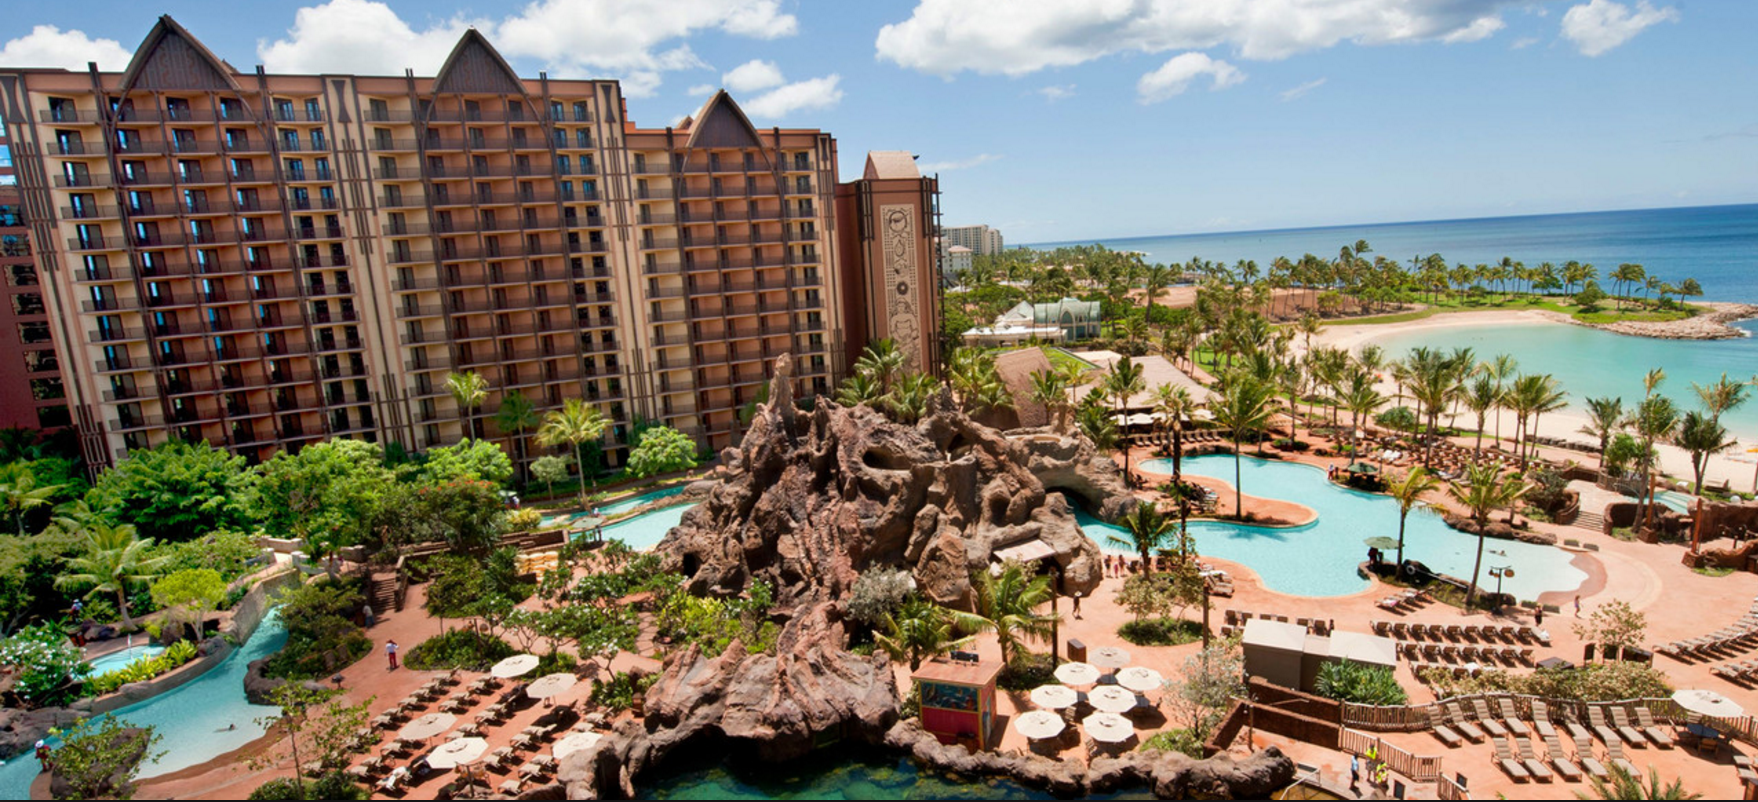 Hawaii hotel discount coupons